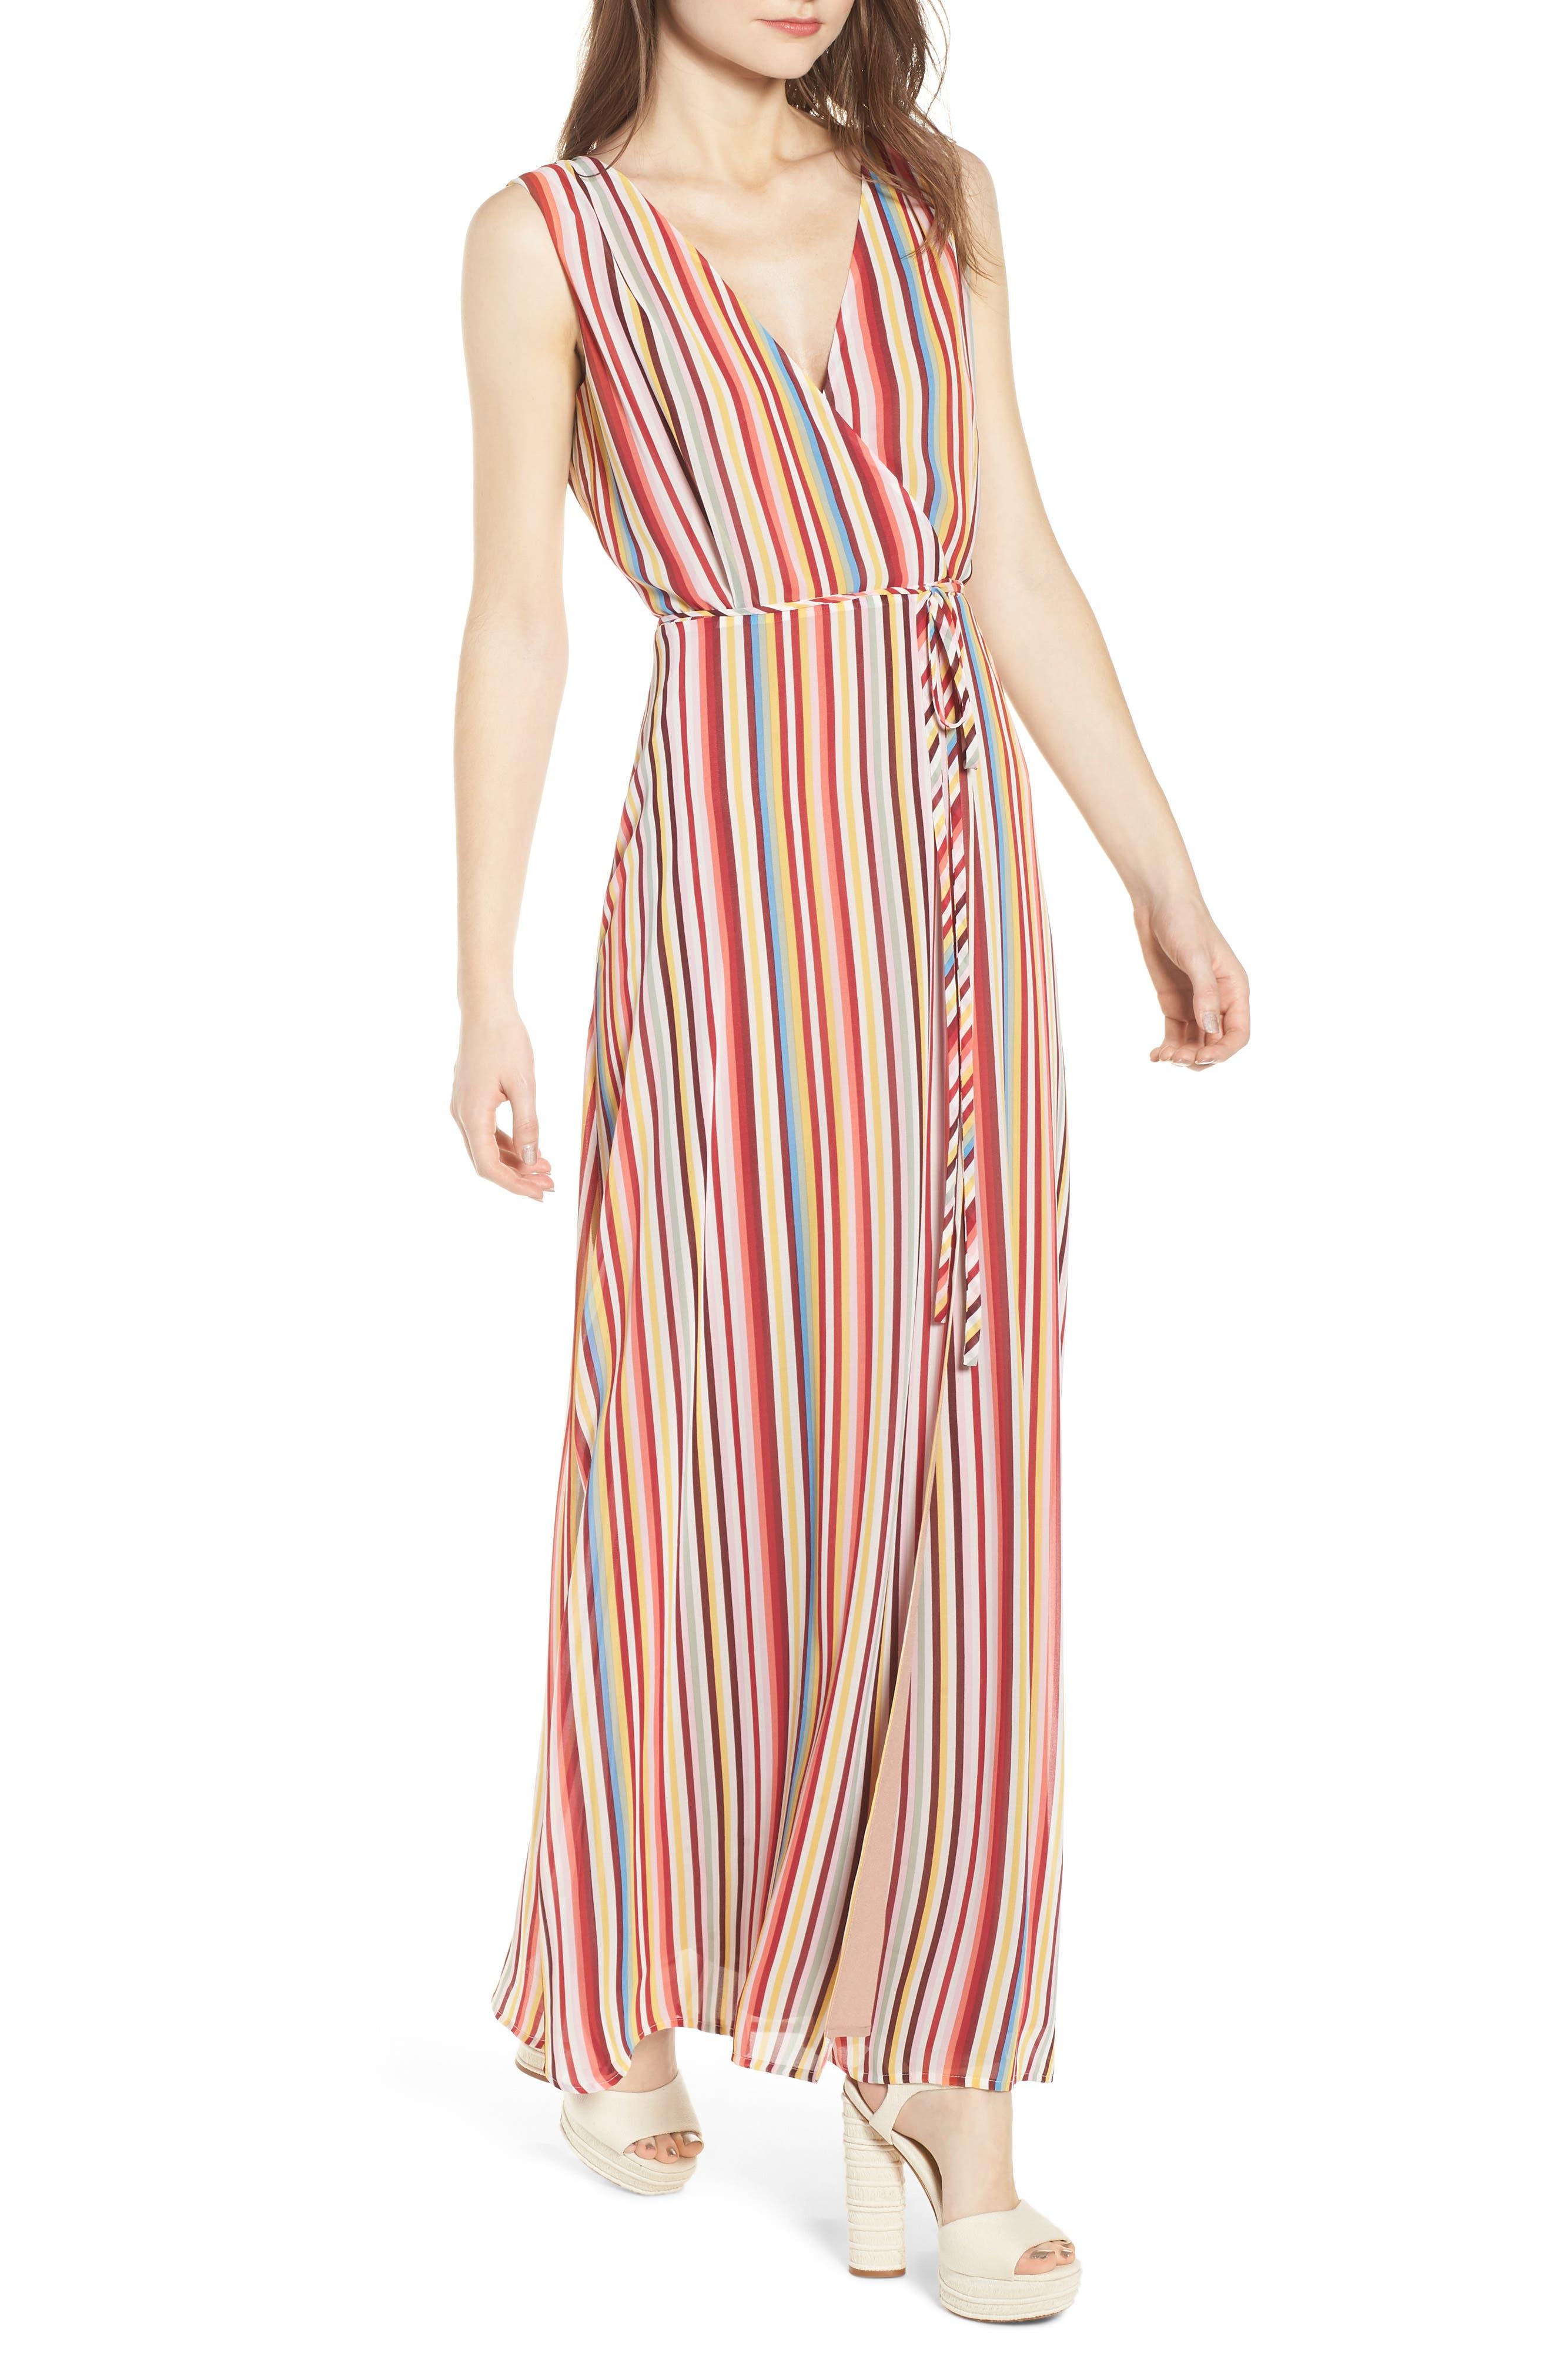 Bobby Wrap Maxi Dress,                             Main thumbnail 1, color,                             Red Multi Stripe